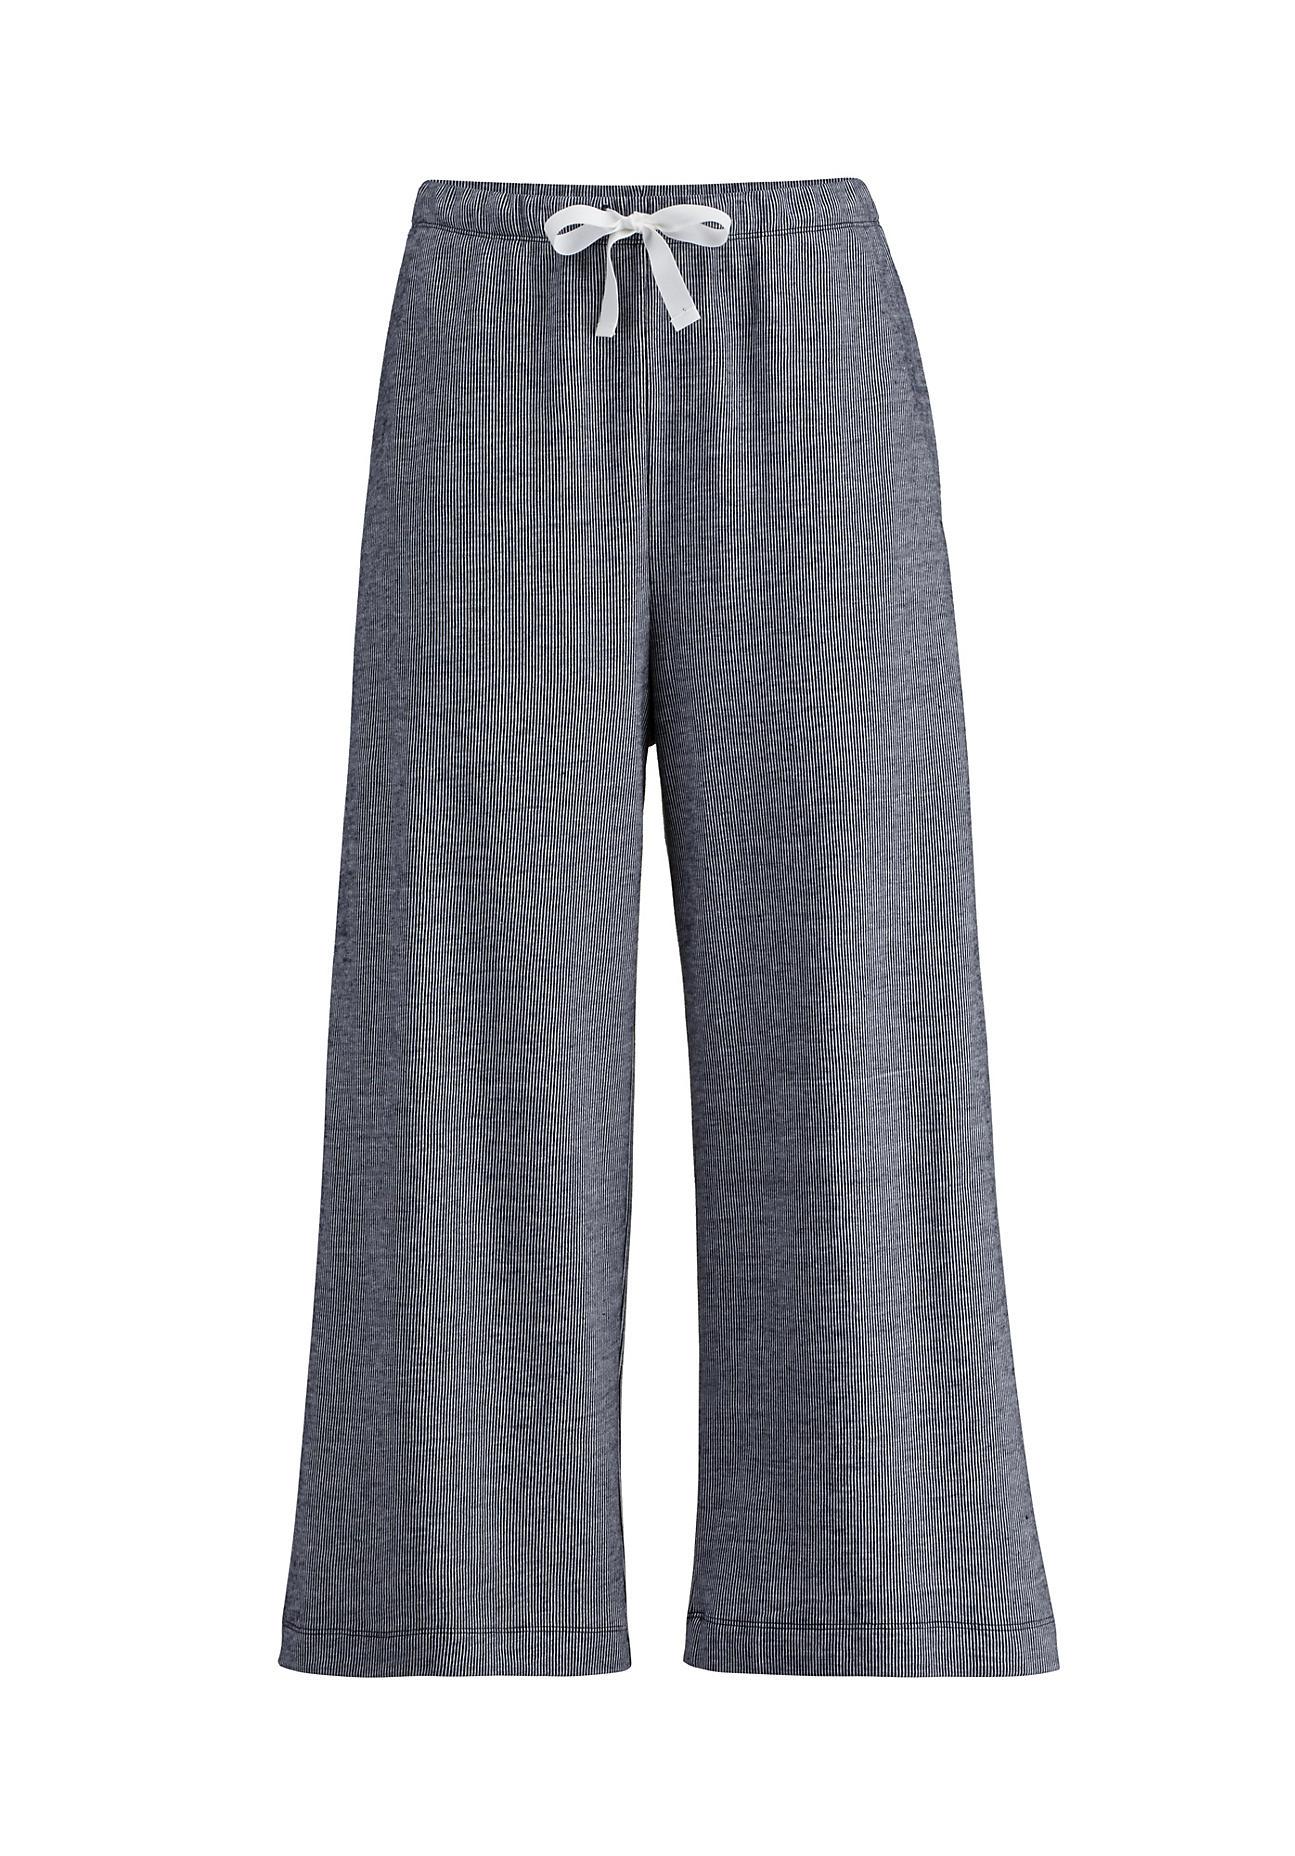 Hosen - hessnatur Damen Jersey Hose aus Bio Baumwolle – blau –  - Onlineshop Hessnatur